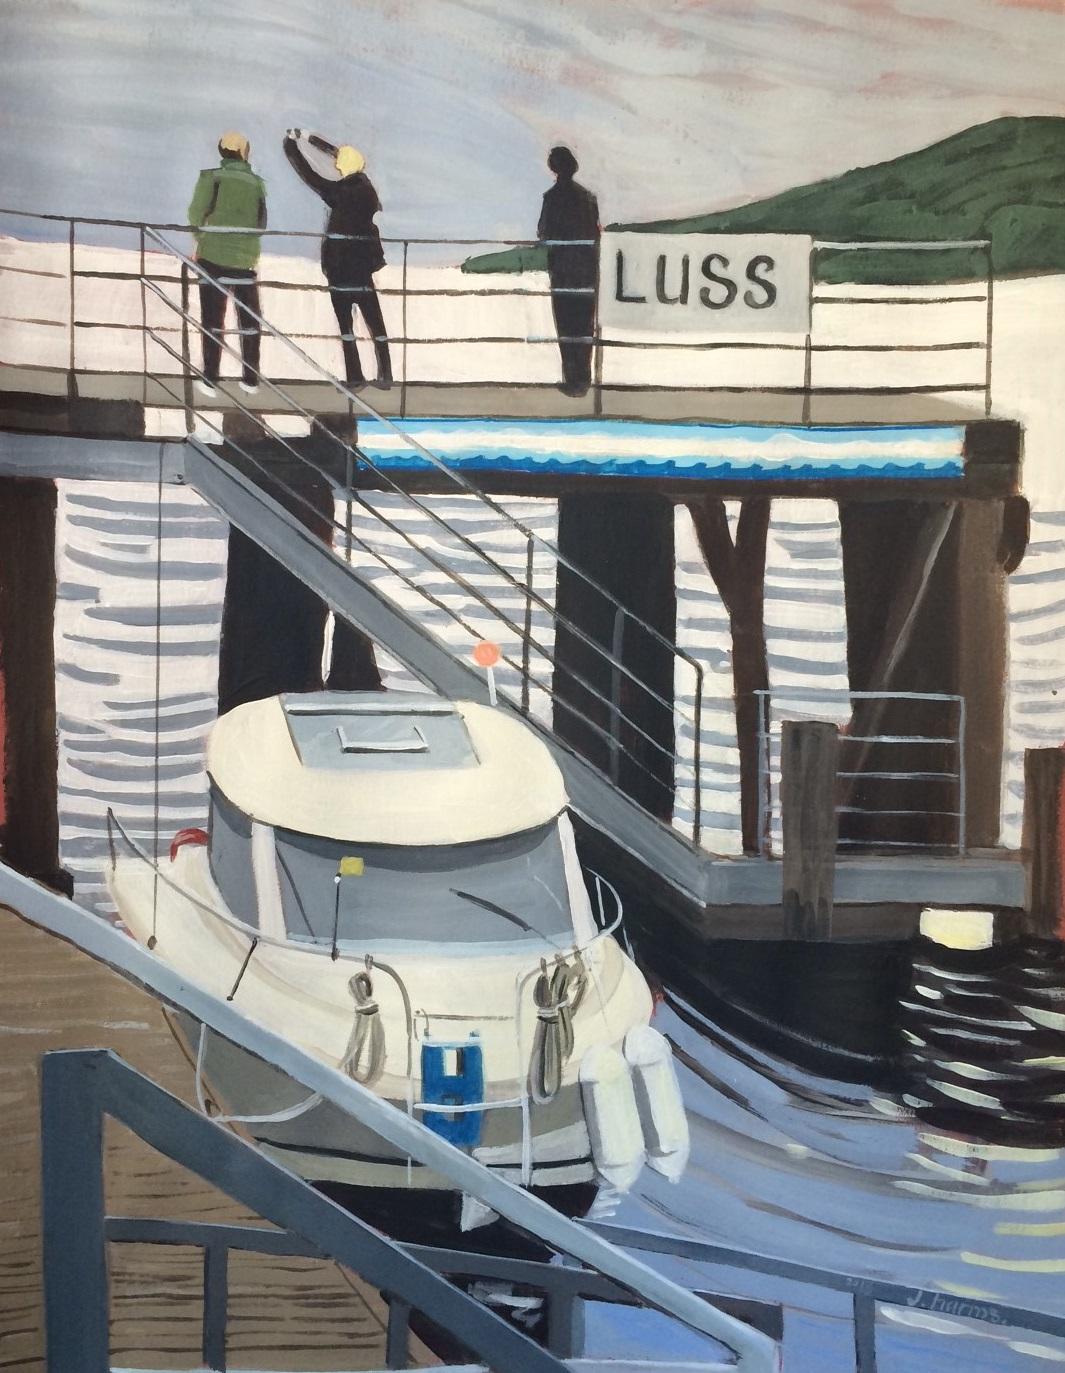 Luss. 2015. J.Harms. 30x40cm. Acrylic on paper. - Copie